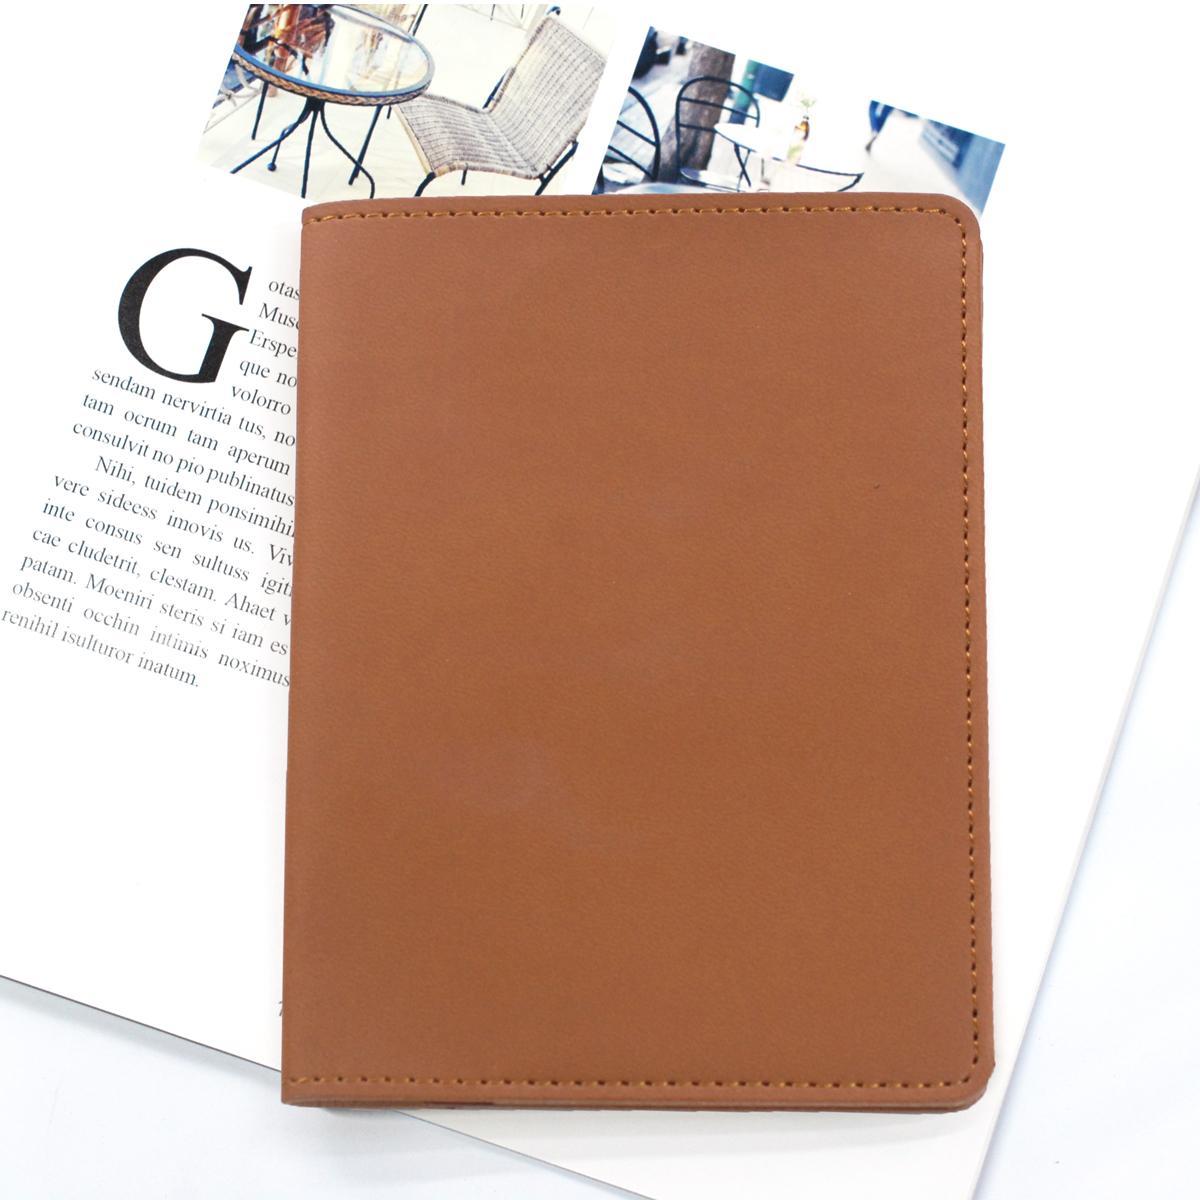 9749b4d50  SG Seller  Passport Holder Travel Organizer Card Holder